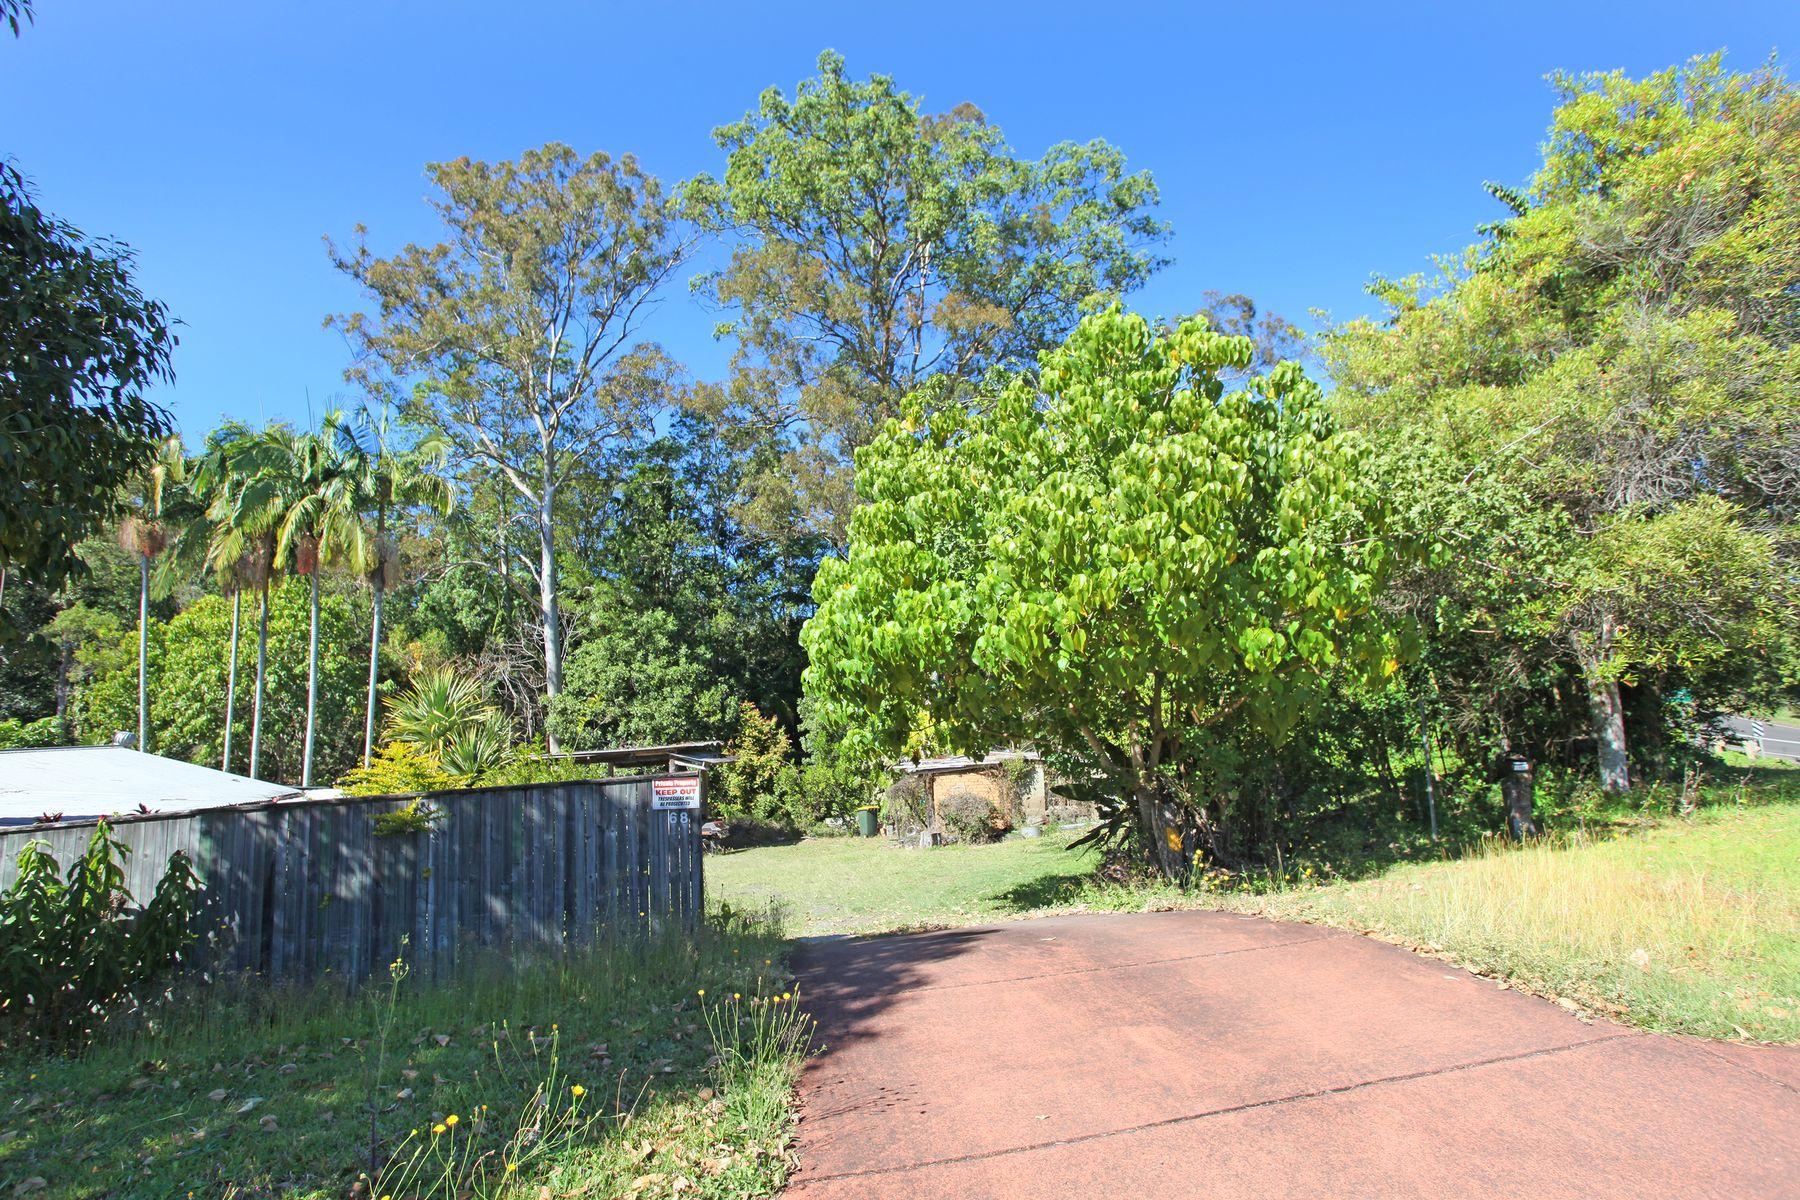 68 Image Flat Road, Nambour, QLD 4560